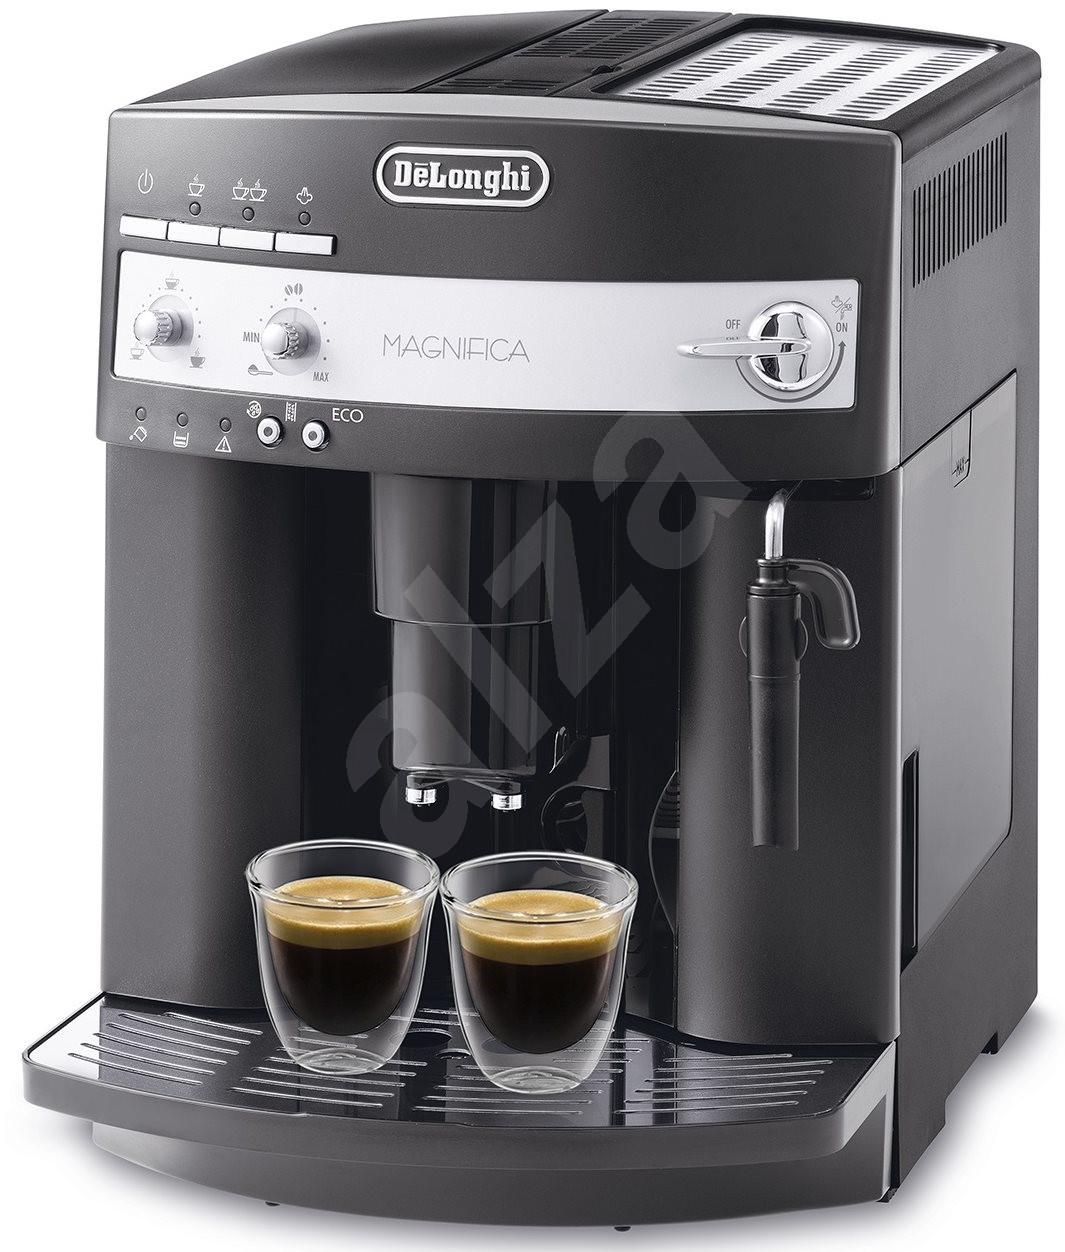 Delonghi Coffee Maker Heating Element : De Longhi ESAM3000B Magnifica - Automatic coffee machine Alzashop.com